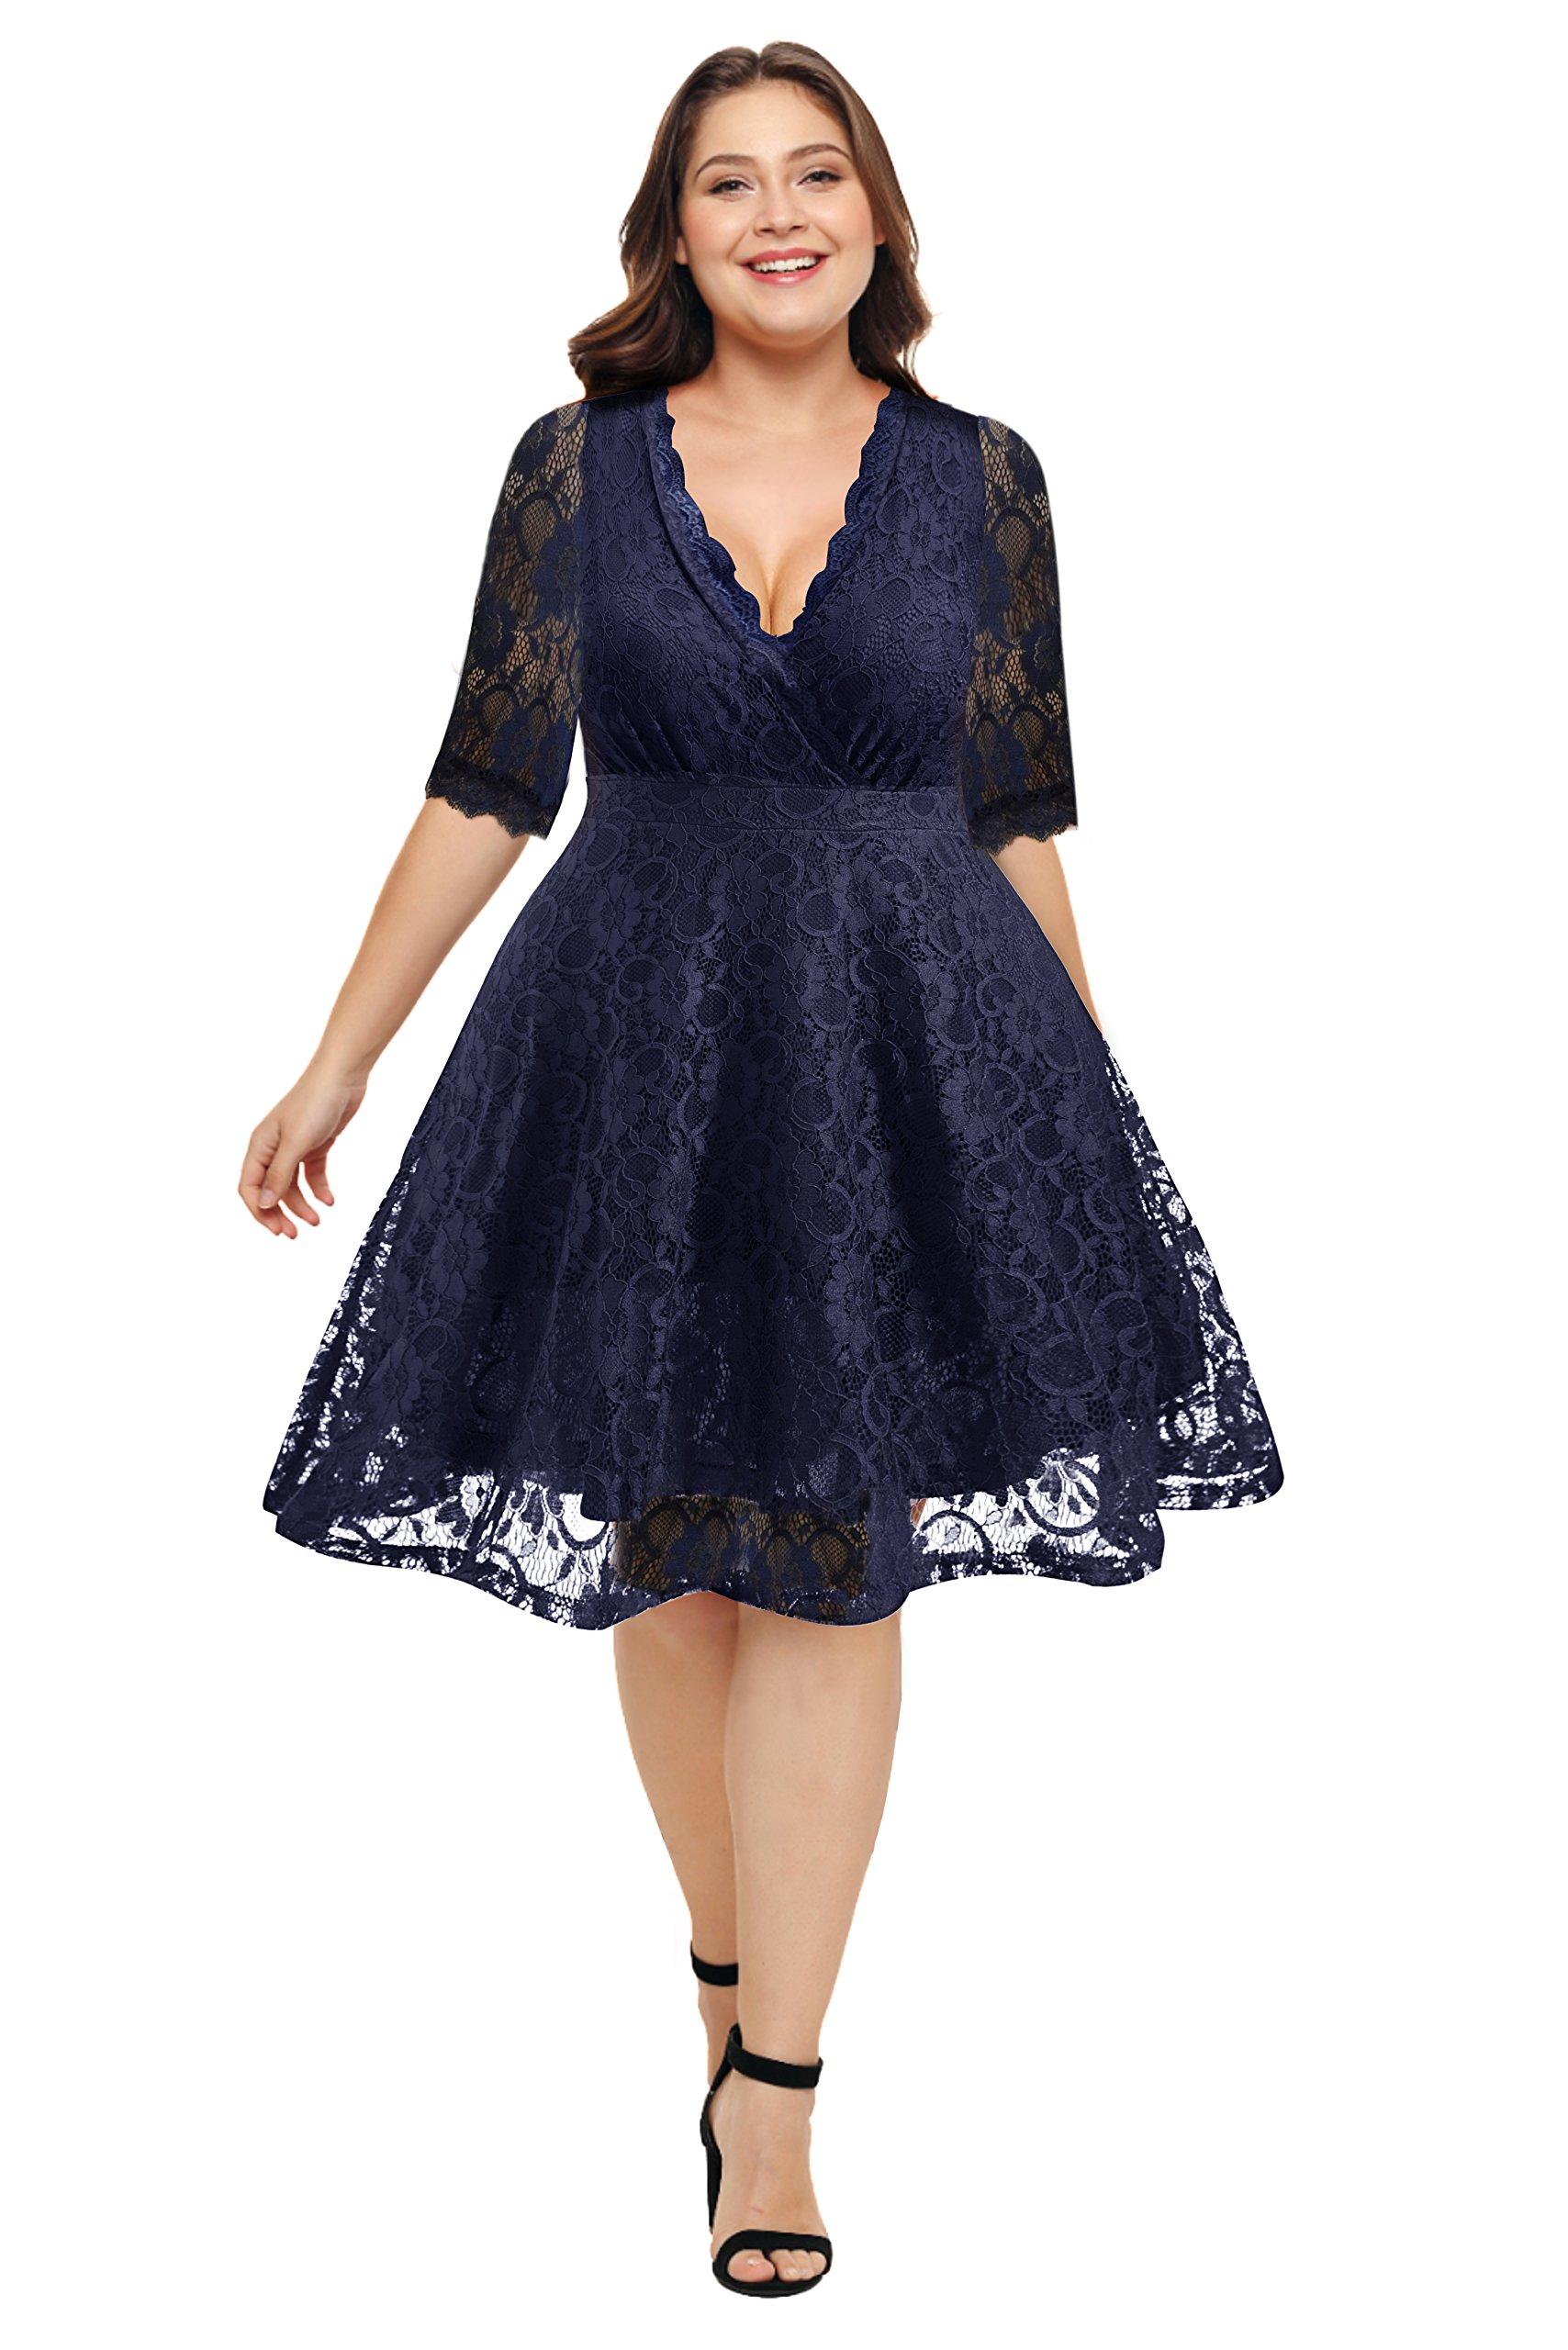 Pinup Fashion Women's Plus Size V-Neckline Lace Flared Cocktail Dress Navy Blue 22W